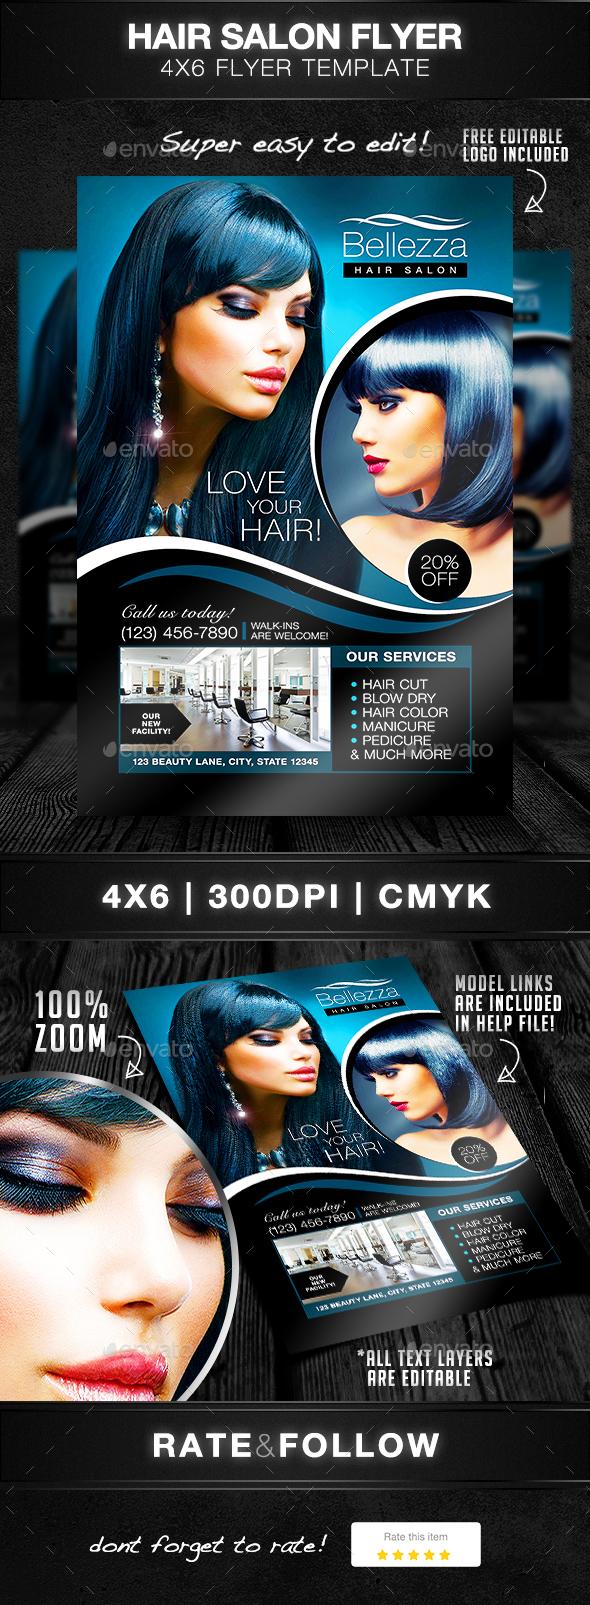 Hair Salon Flyer Template